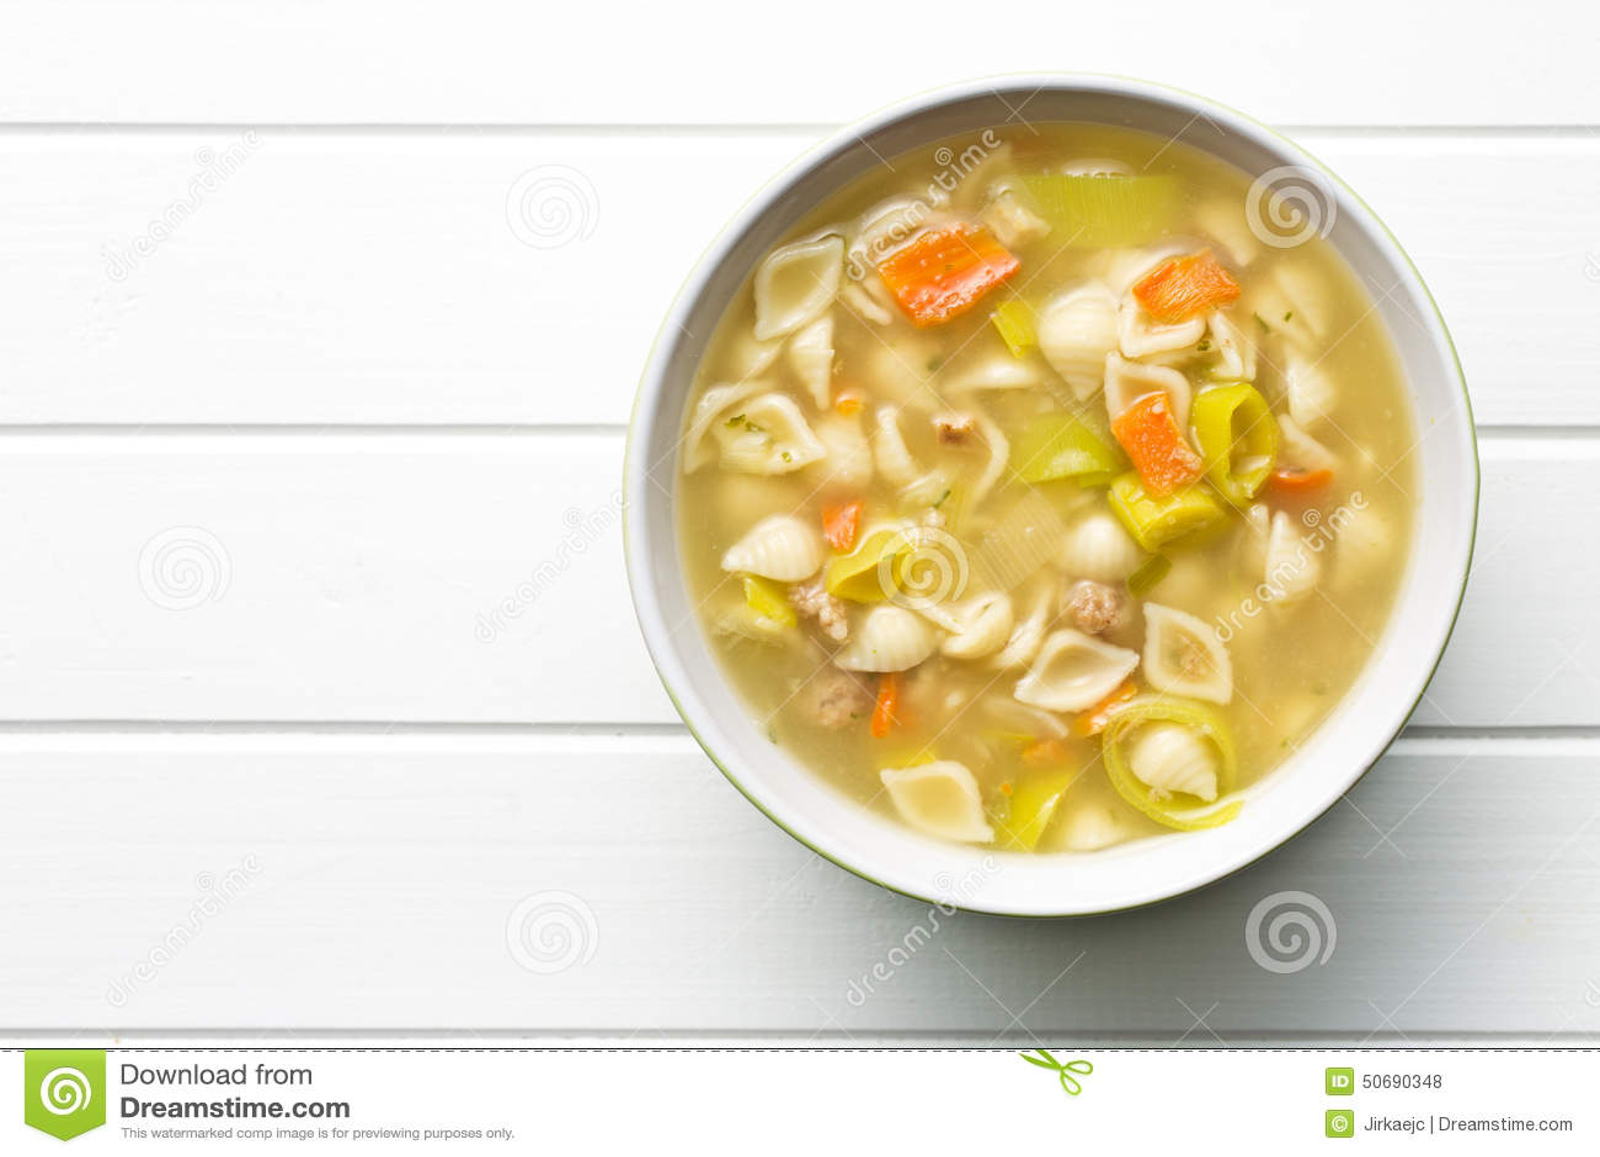 Download 与面团的蔬菜汤 库存照片. 图片 包括有 蔬菜, 正餐, 没人, 餐馆, 苹果酱, 素食主义者, 美食, 膳食 - 50690348